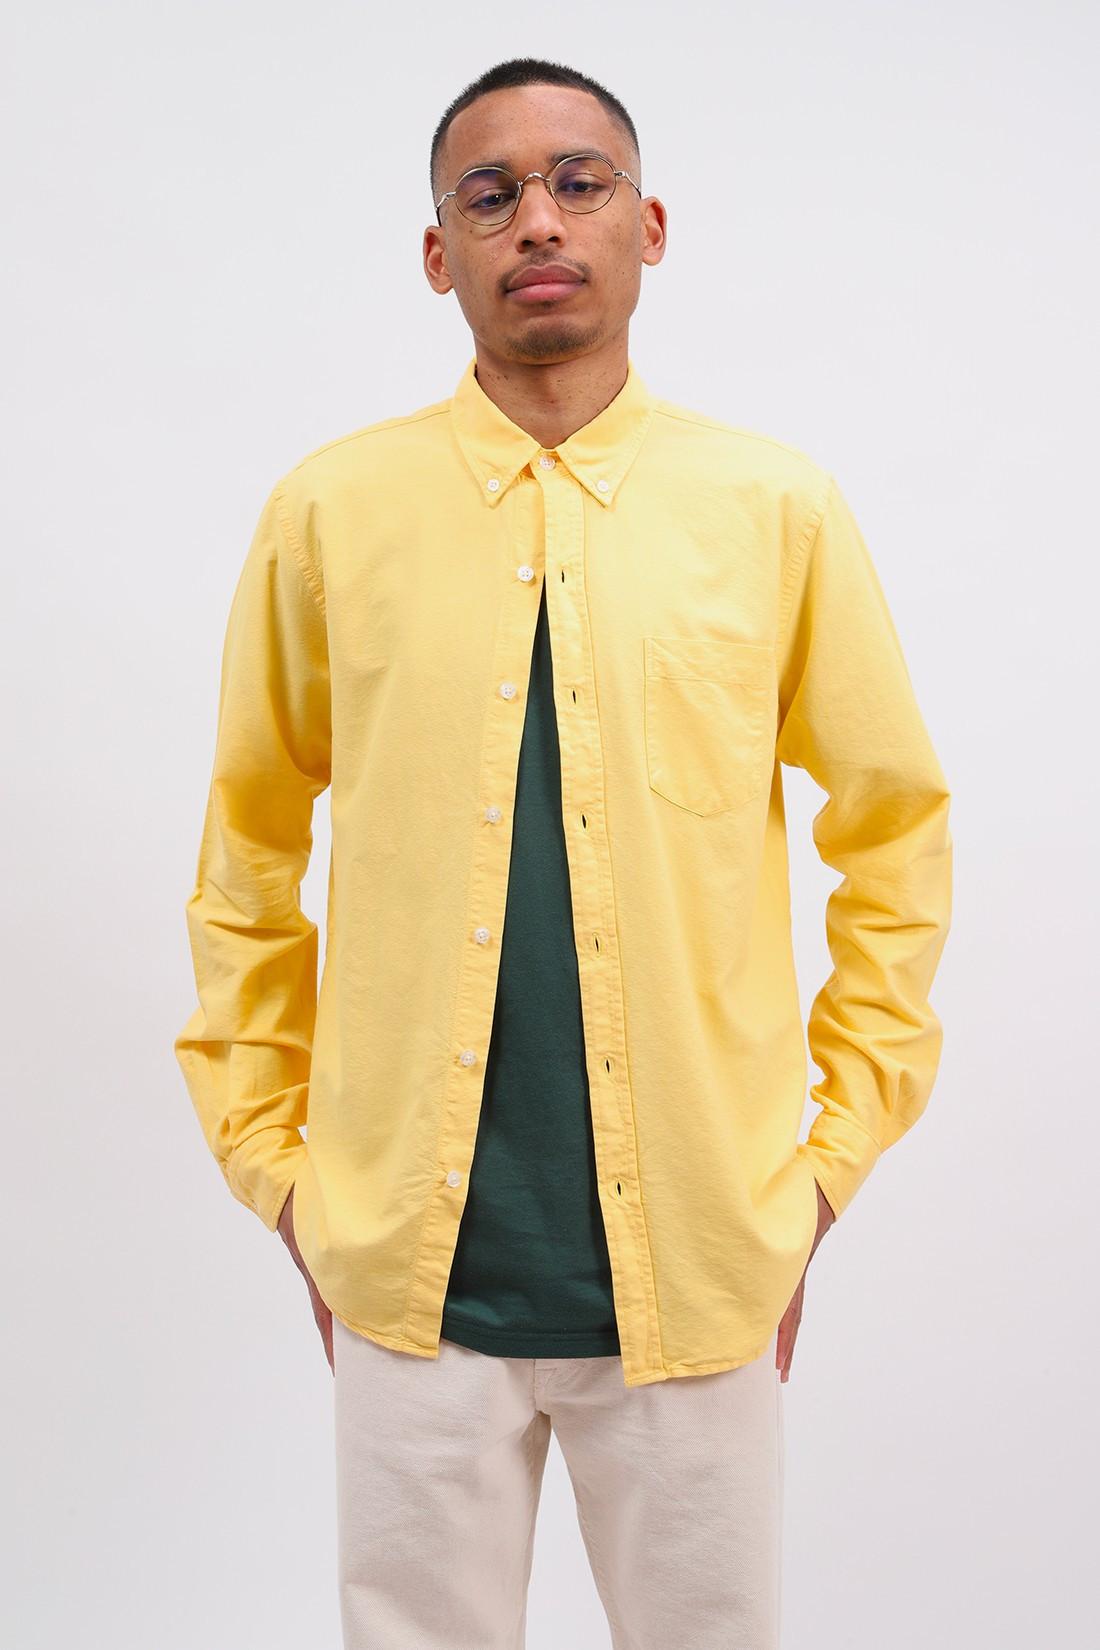 COLORFUL STANDARD / Organic button down shirt Lemon yellow